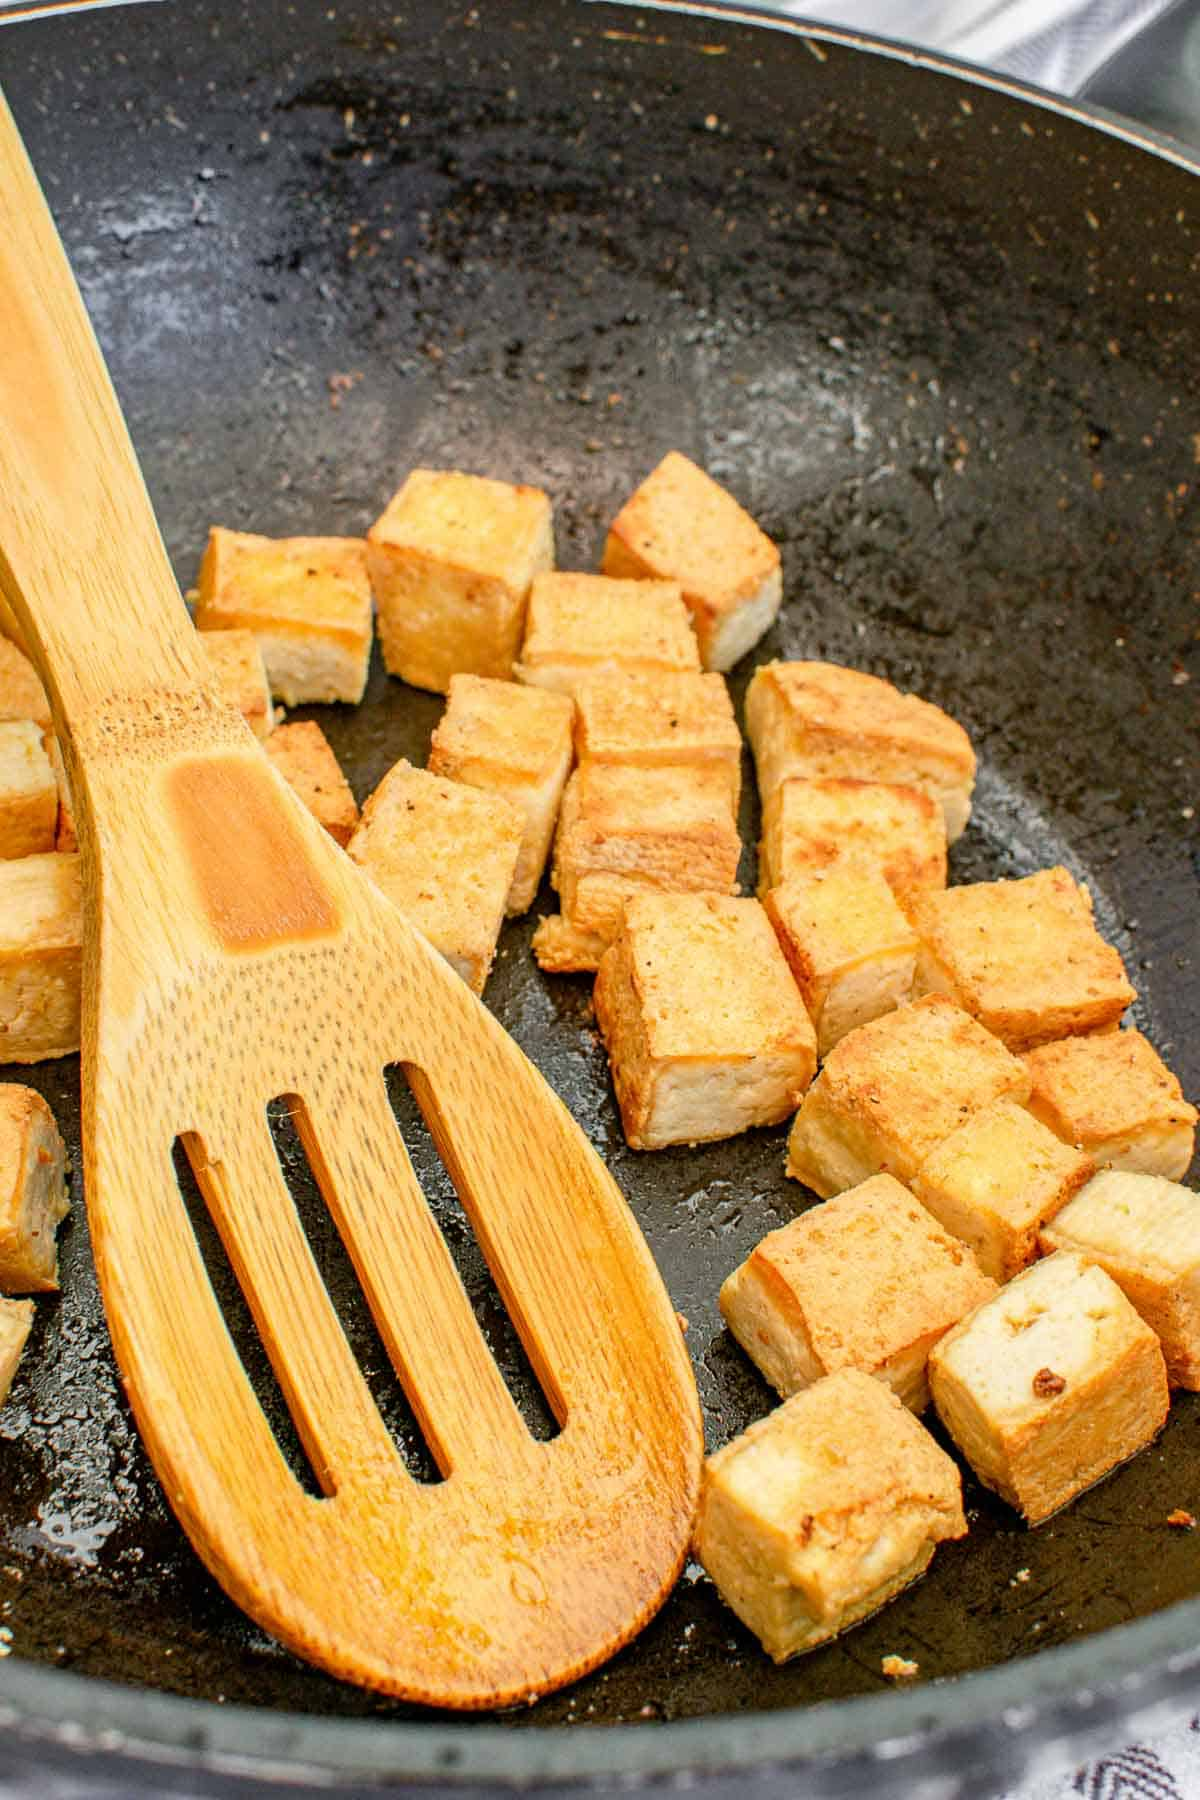 Frying tofu cubes until crispy.